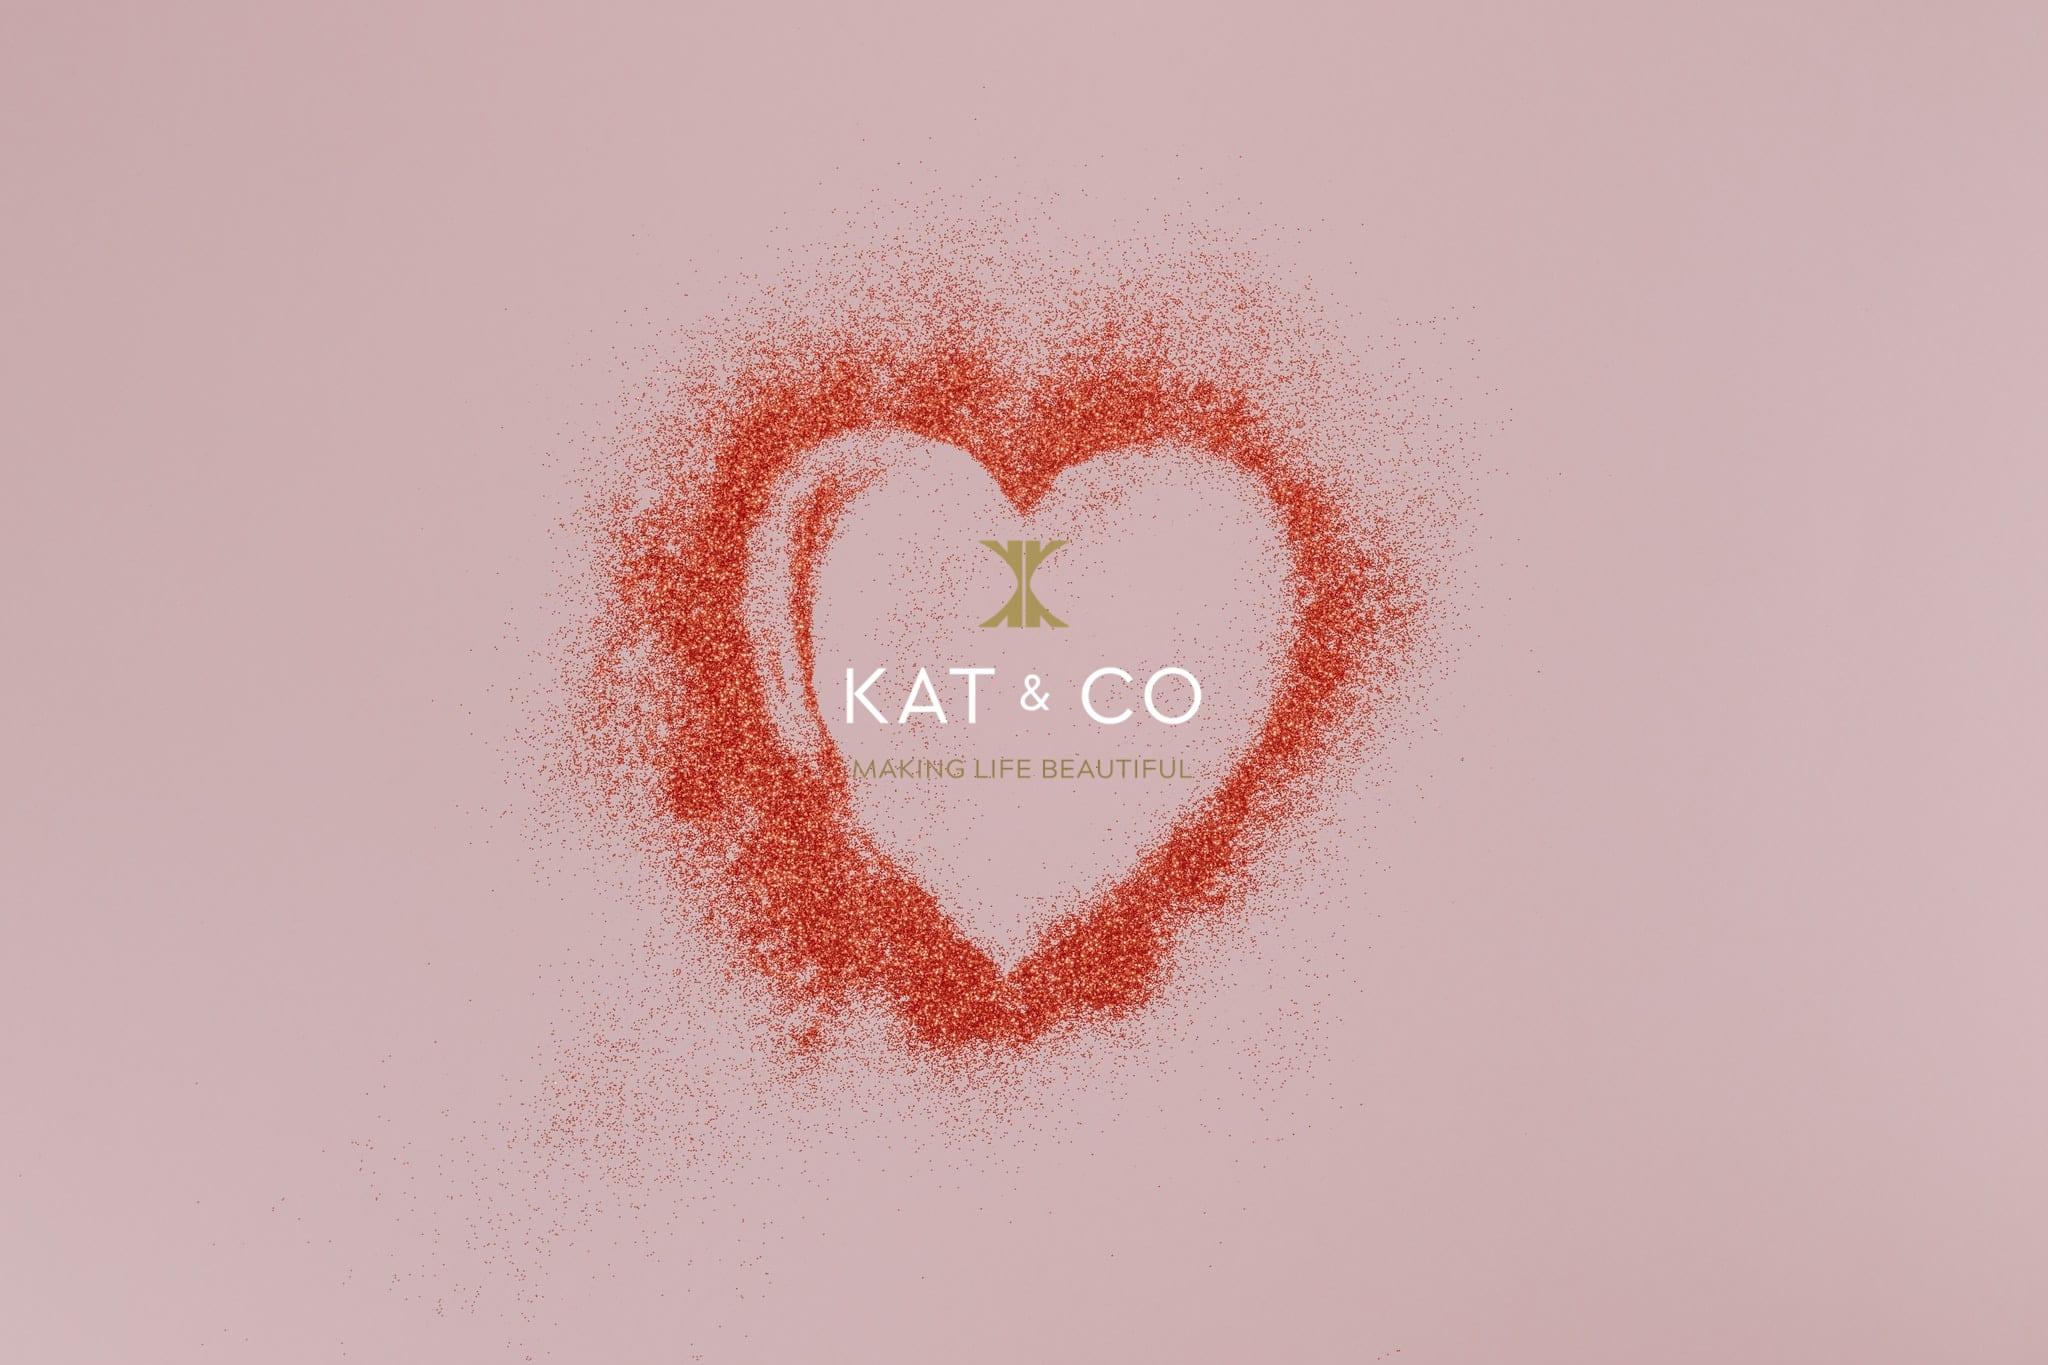 valentine at kat & co